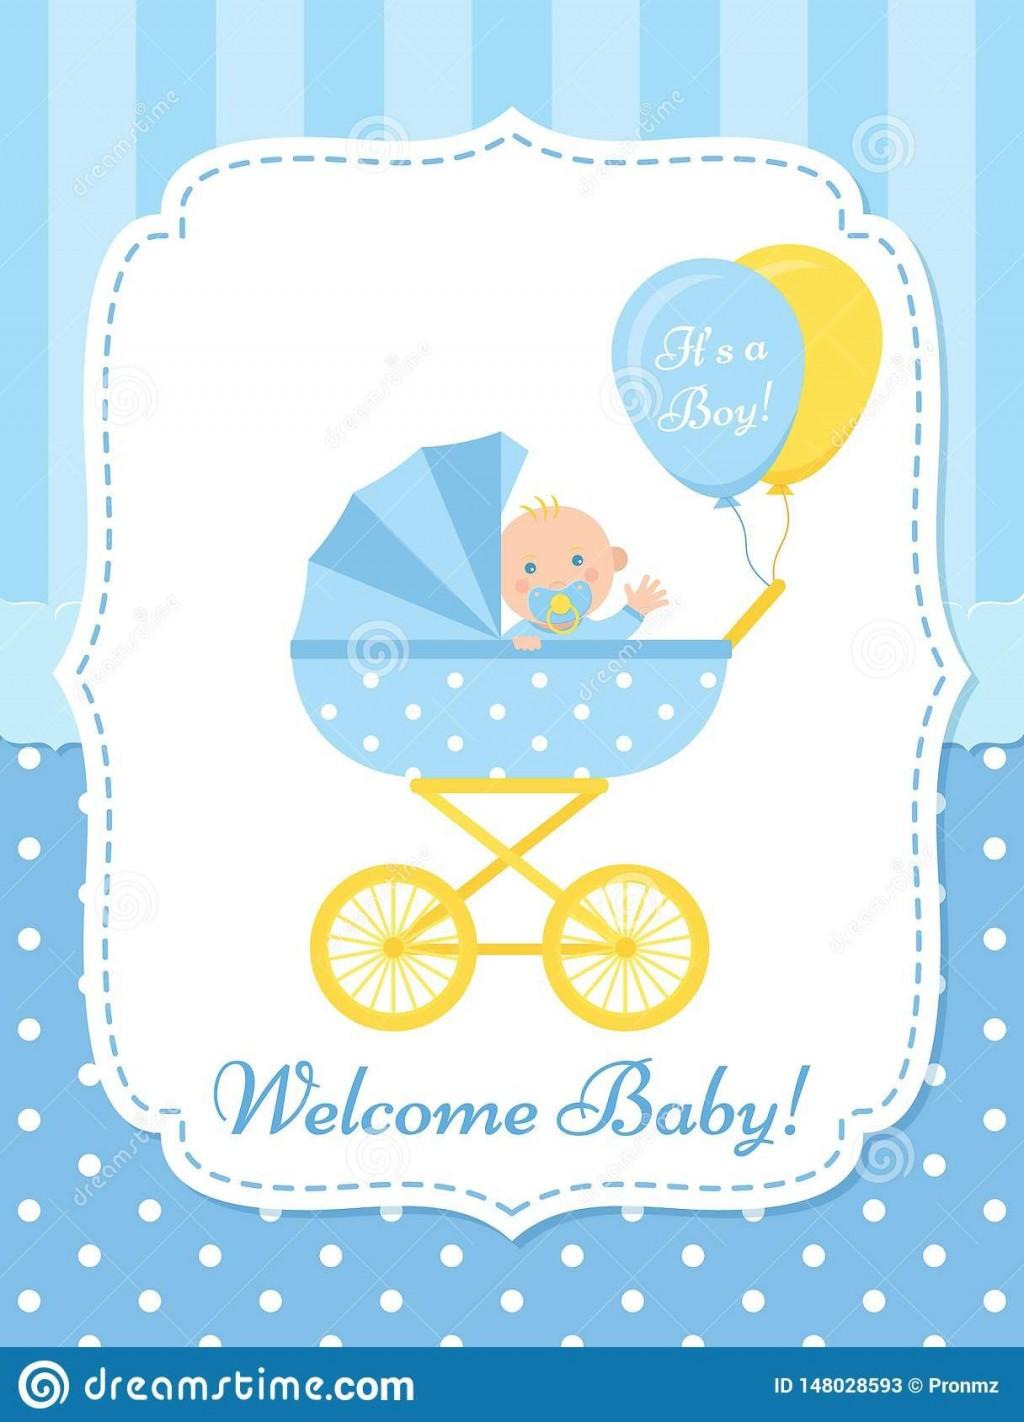 004 Striking Free Printable Baby Shower Card For Boy High Definition  BingoLarge